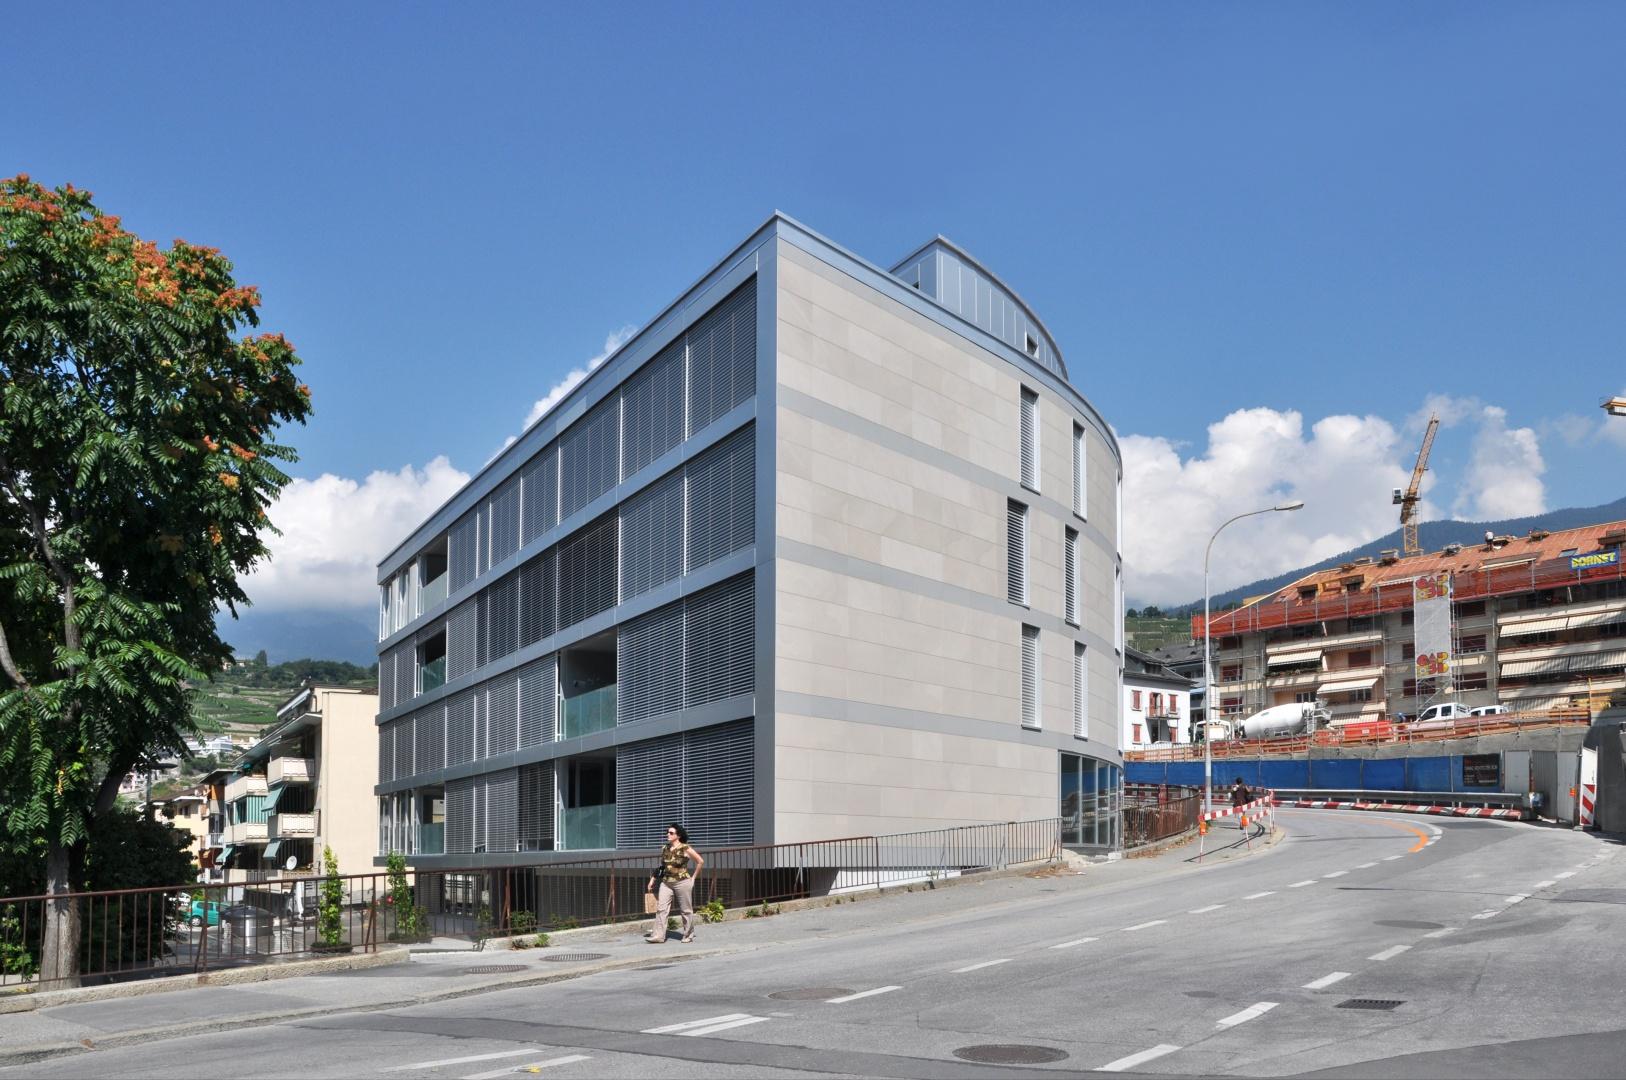 Vue extérieure, angle sud-est © Savioz & Di Berardino architectes